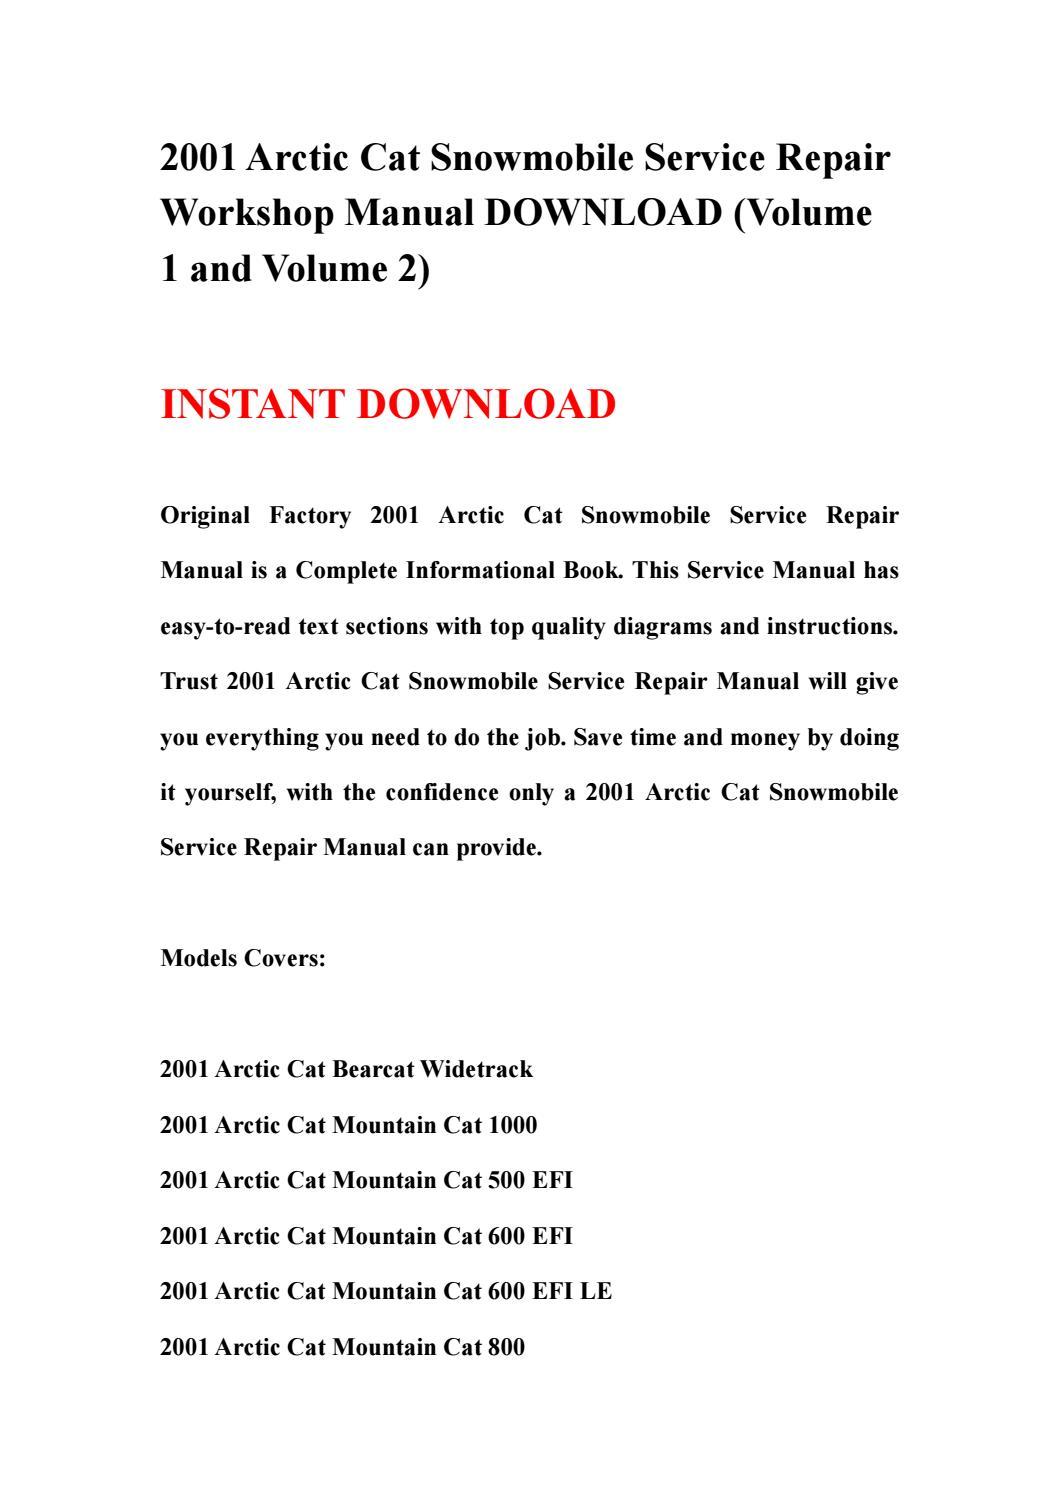 hight resolution of 2001 arctic cat snowmobile service repair workshop manual download volume 1 and volume 2 by kjsnehfnn issuu